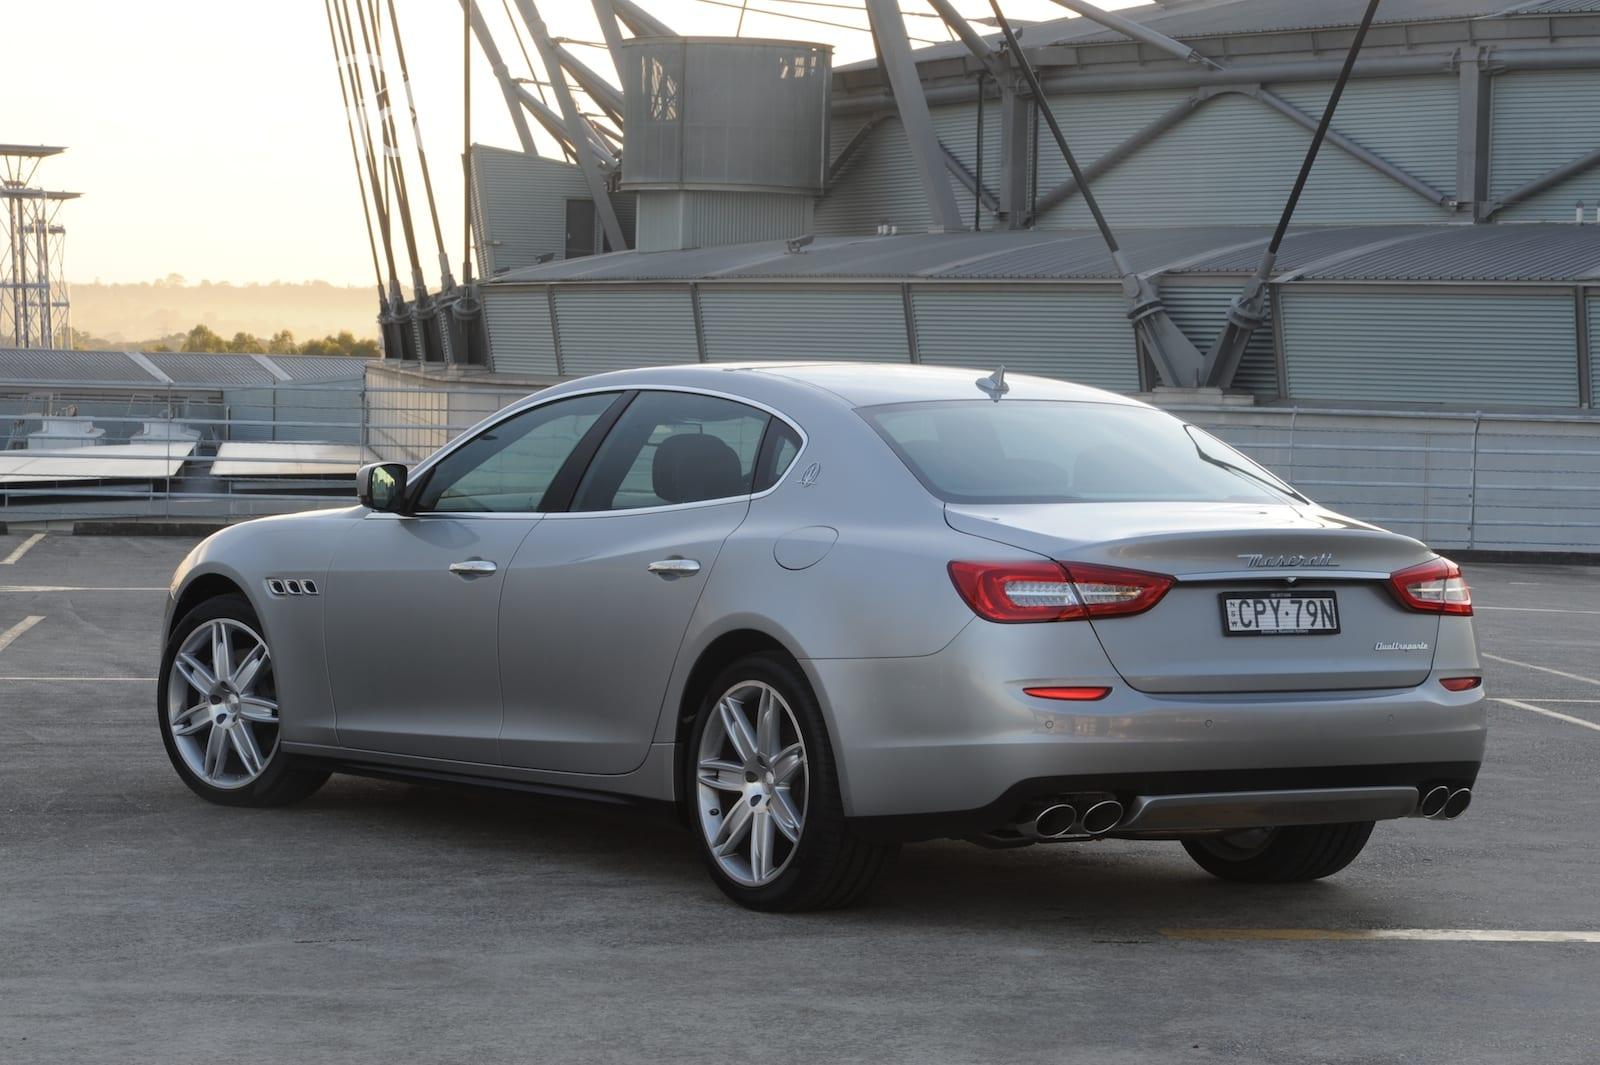 2014 Maserati Quattroporte Diesel Review | CarAdvice